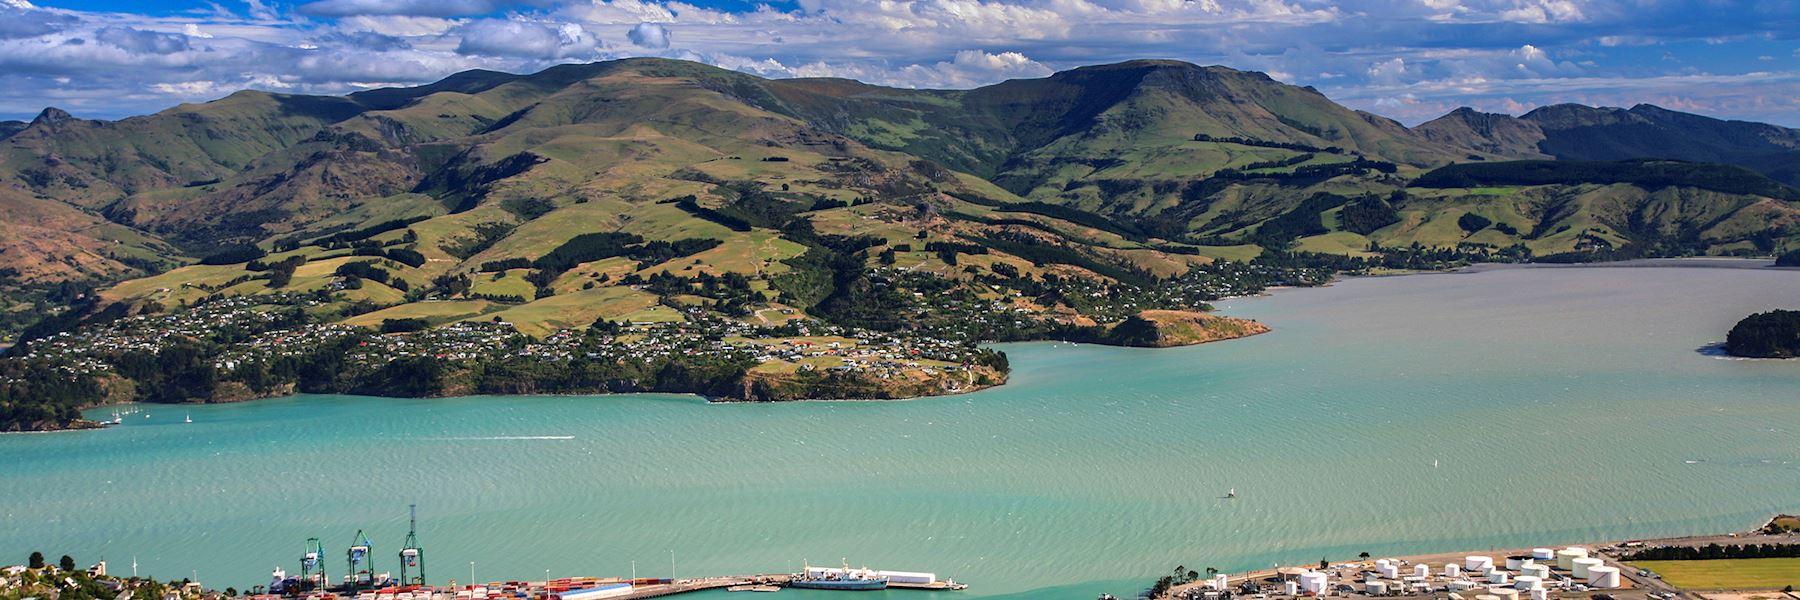 Visit Akaroa & Banks Peninsula, New Zealand